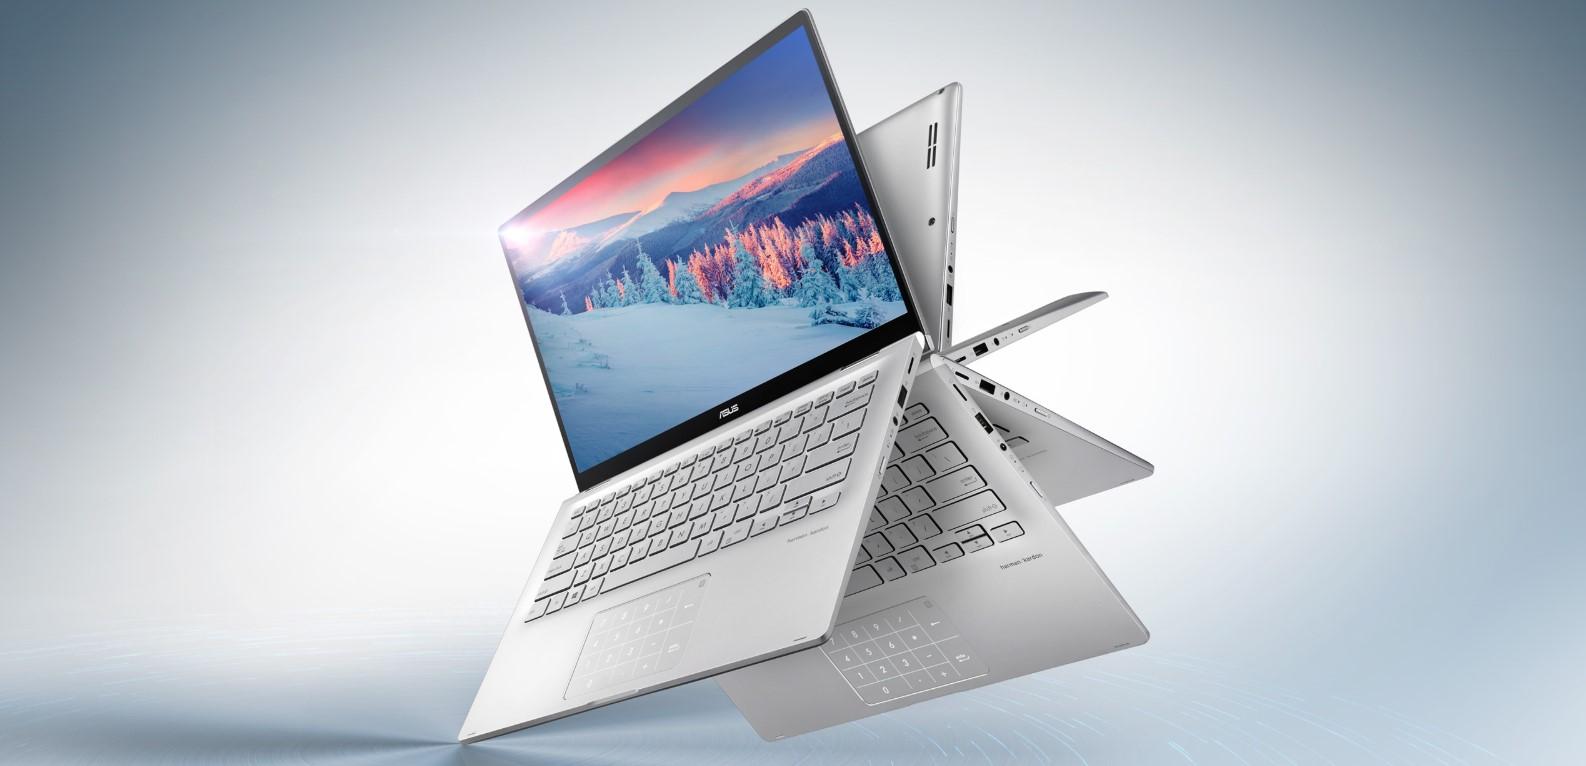 PC Portable ASUS Zenbook Flip UM462DA-AI010T